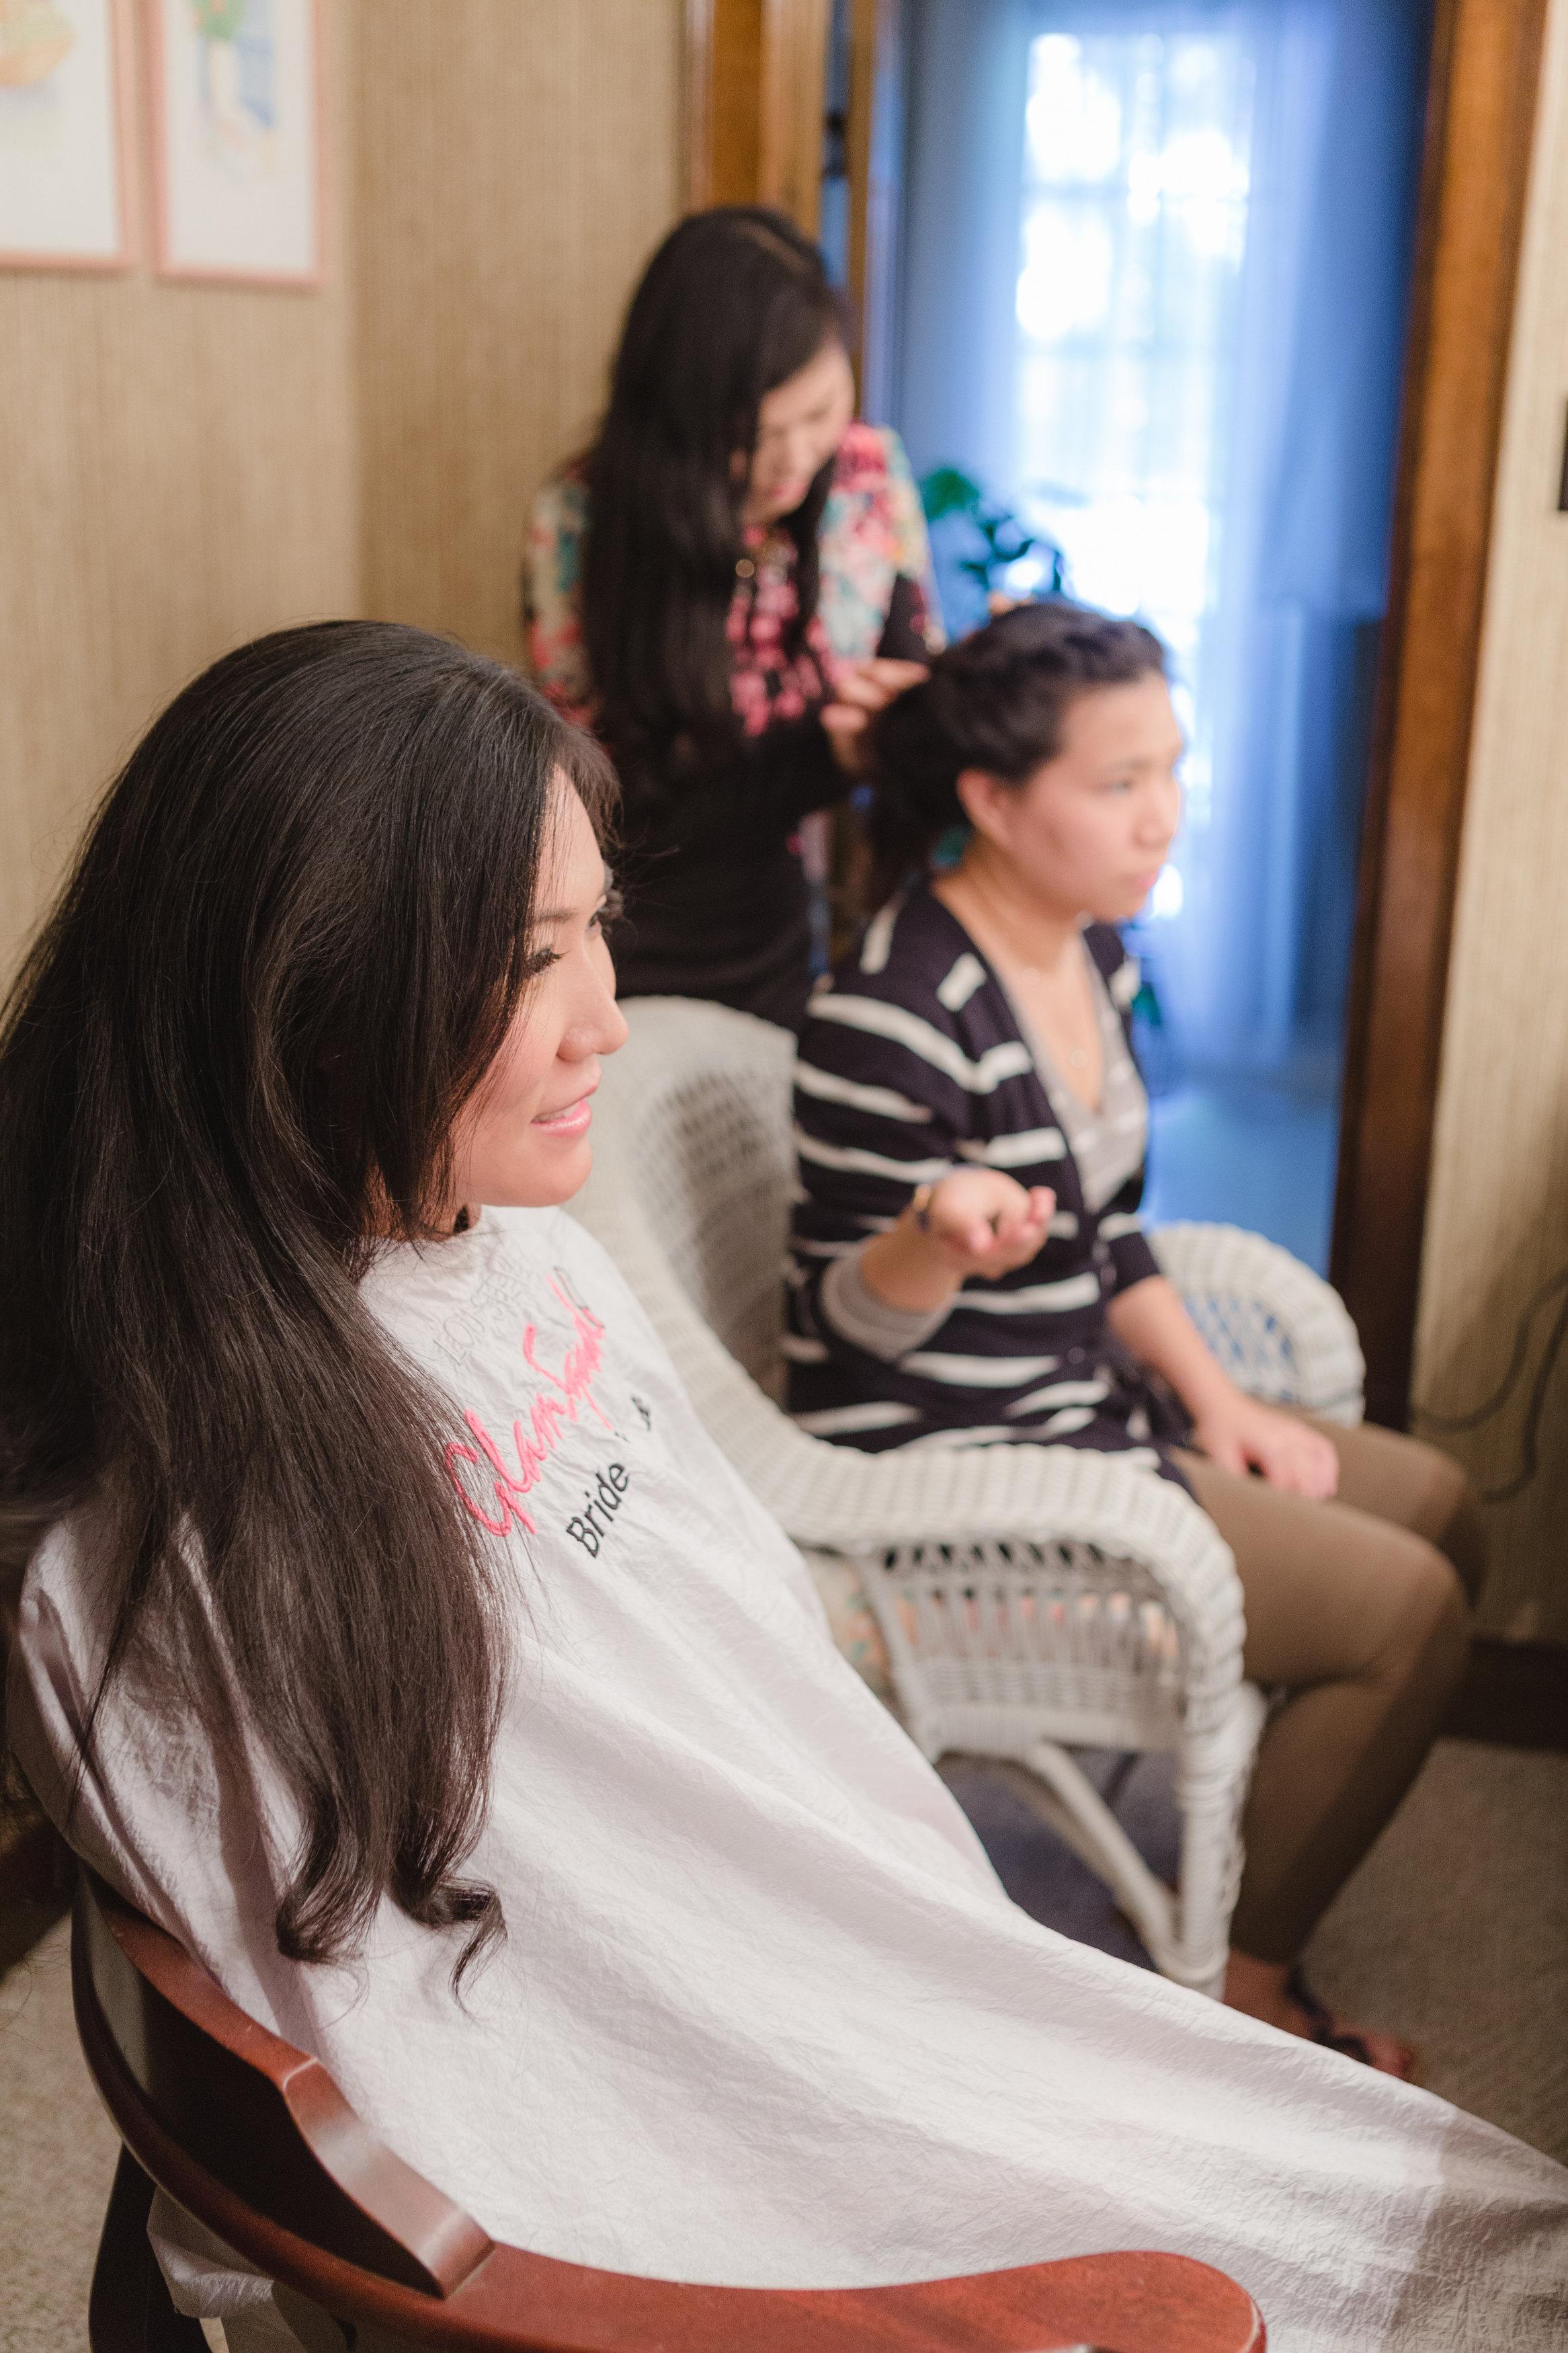 View More: http://davidabelphotography.pass.us/10_18_14